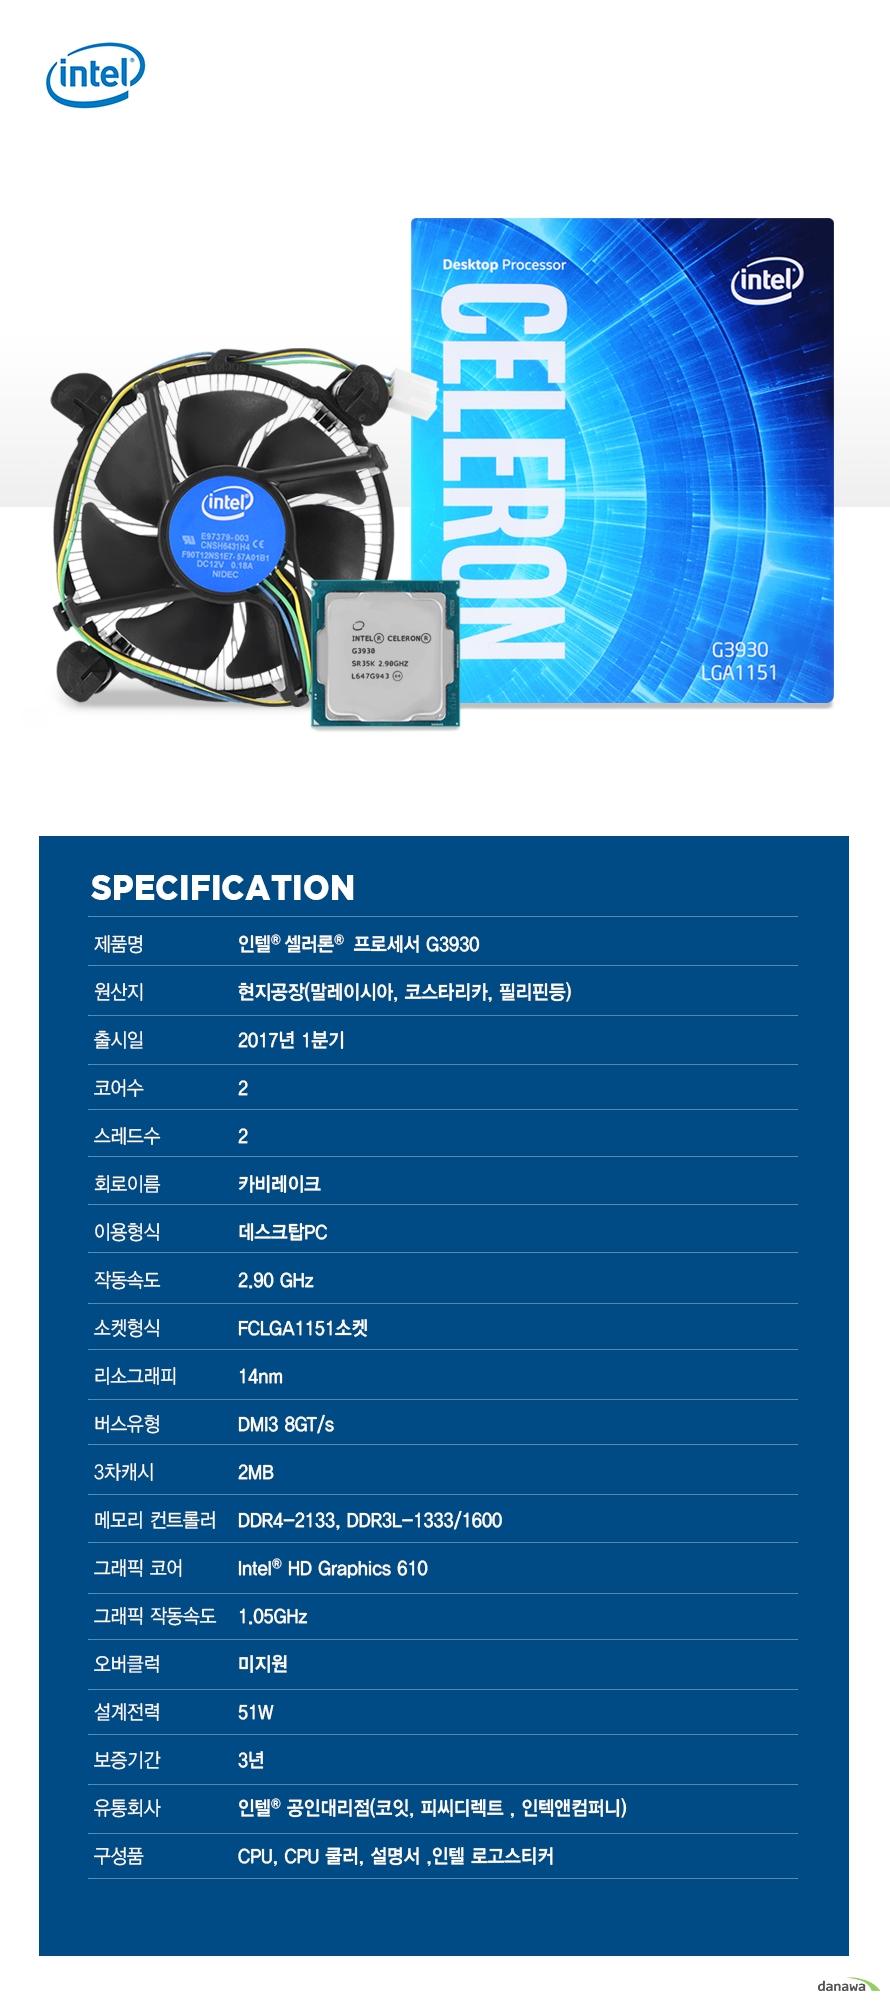 SPECIFICATION                제품명 인텔 셀러론 프로세서 G3930                원산지 현지공장 말레이시아 코스타리카 필리핀등                출시일 2017년 1분기                코어수 2                스레드수 2                회로이름 카비레이크                이용형식 데스크탑PC                작동속도 2.90GHZ                소켓형식 FCLGA1151소켓                리소그래피 14NM                버스유형 DMI3 8GT/S                3차캐시 2MB                메모리 컨트롤러 DDR4-2133 DDR3L-1333/1600                그래픽 코어 INTEL HD GRAPHICS 610                그래픽 작동속도 1.05GHZ                오버클럭 미지원                설계전력 51W                보증기간 3년                유통회사 인텔 공인대리점 코잇 피씨디렉트 인텍엔 컴퍼니                구성품 CPU CPU쿨러 설명서 인텔 로고스티커